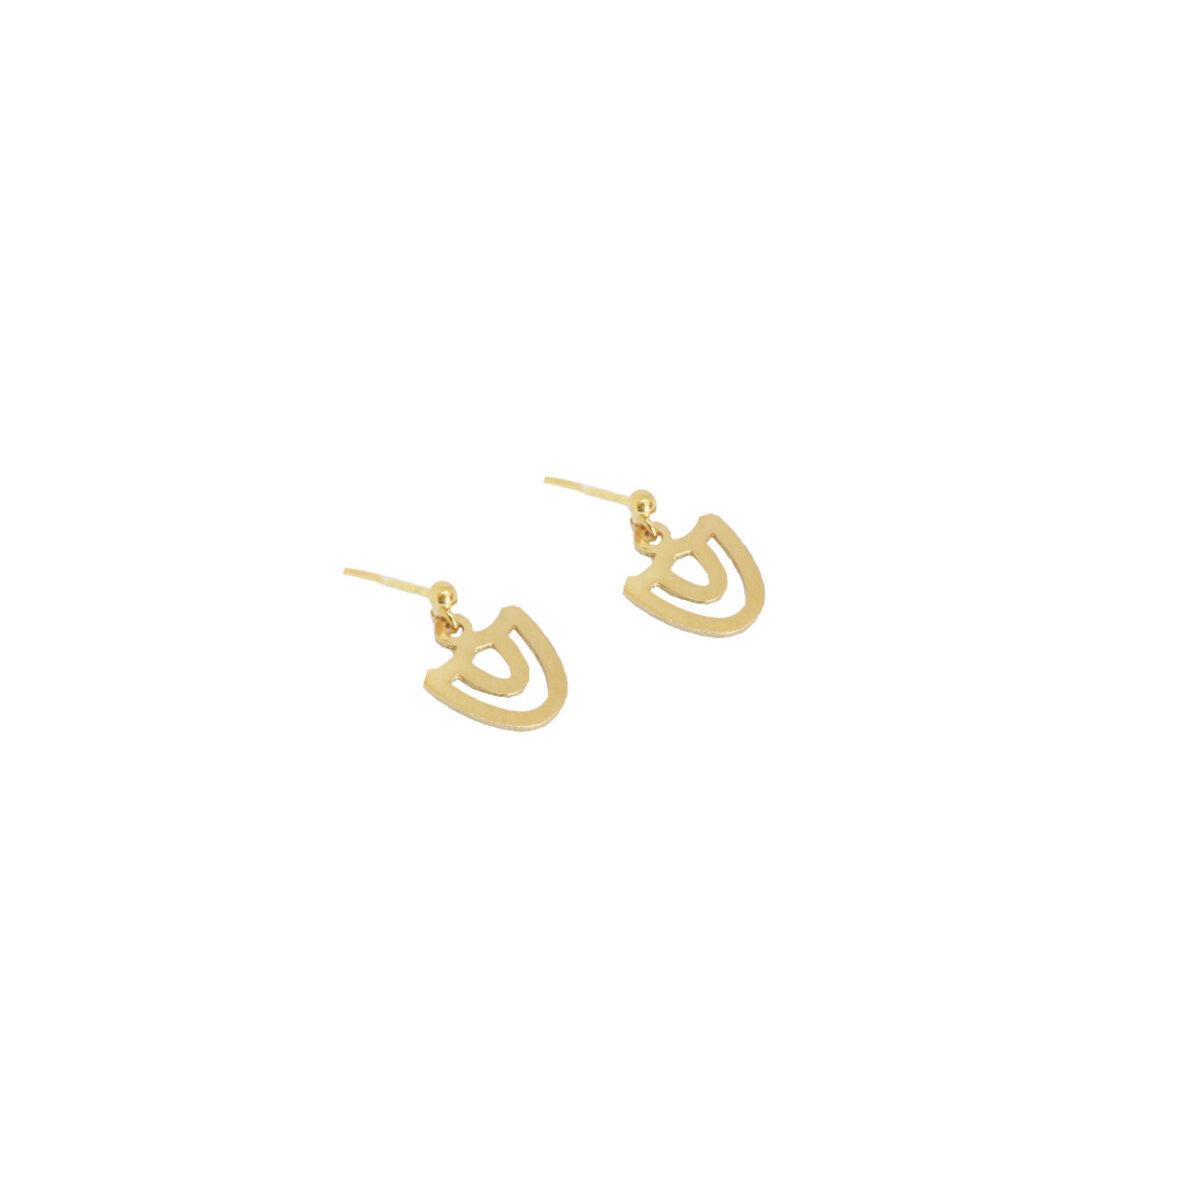 Tholos earrings II gold plated